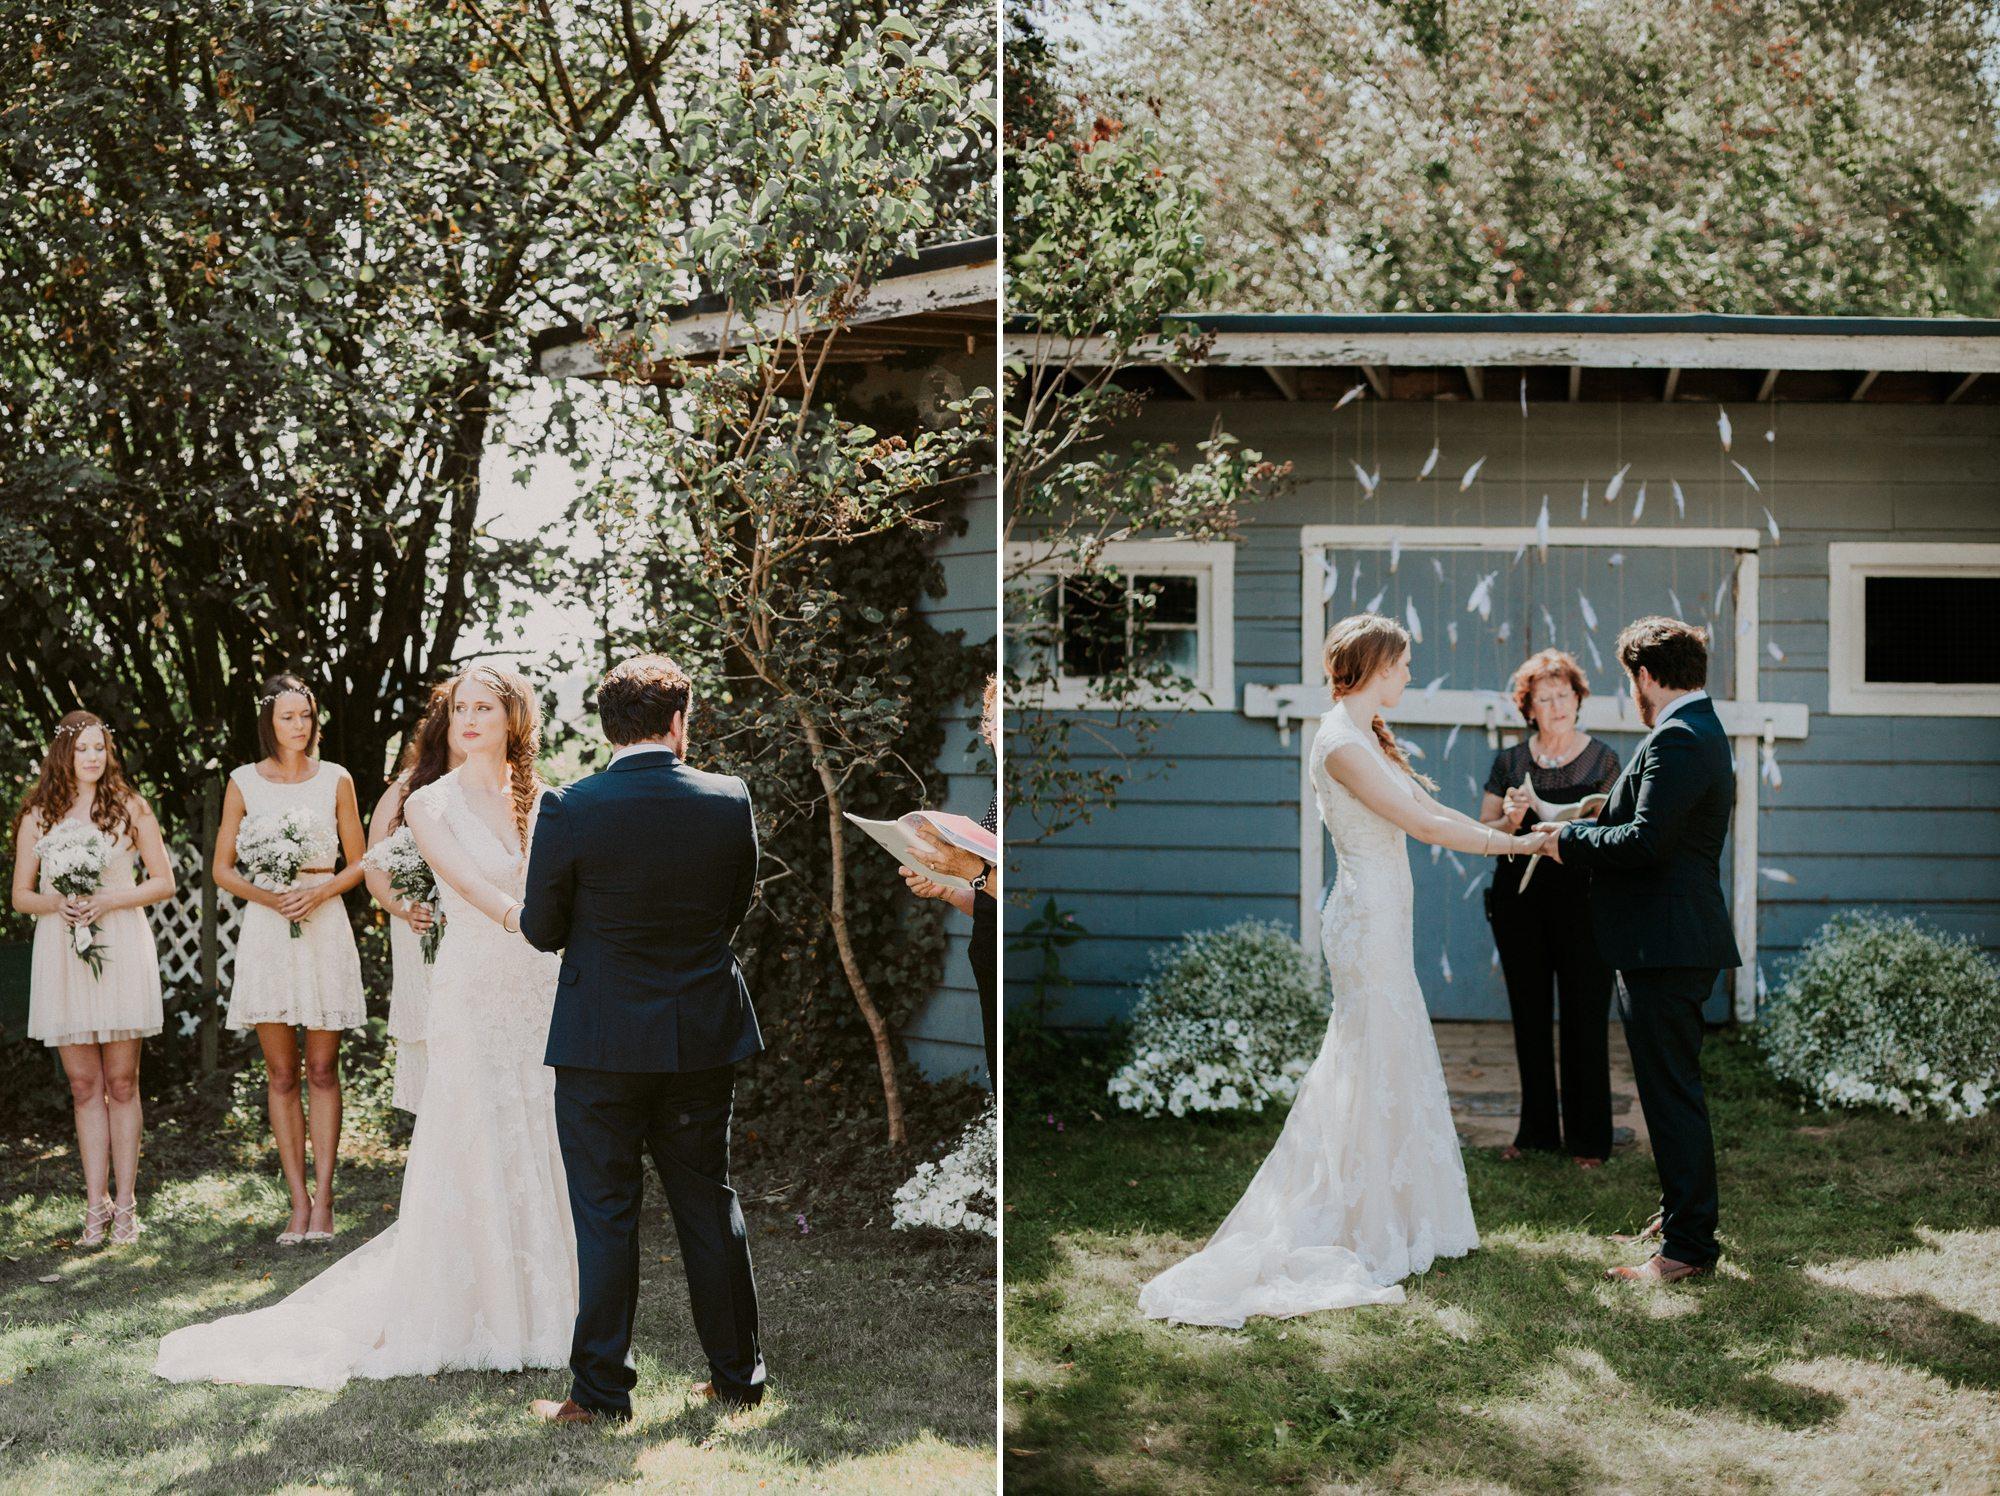 823-abbotsford-wedding-photographer